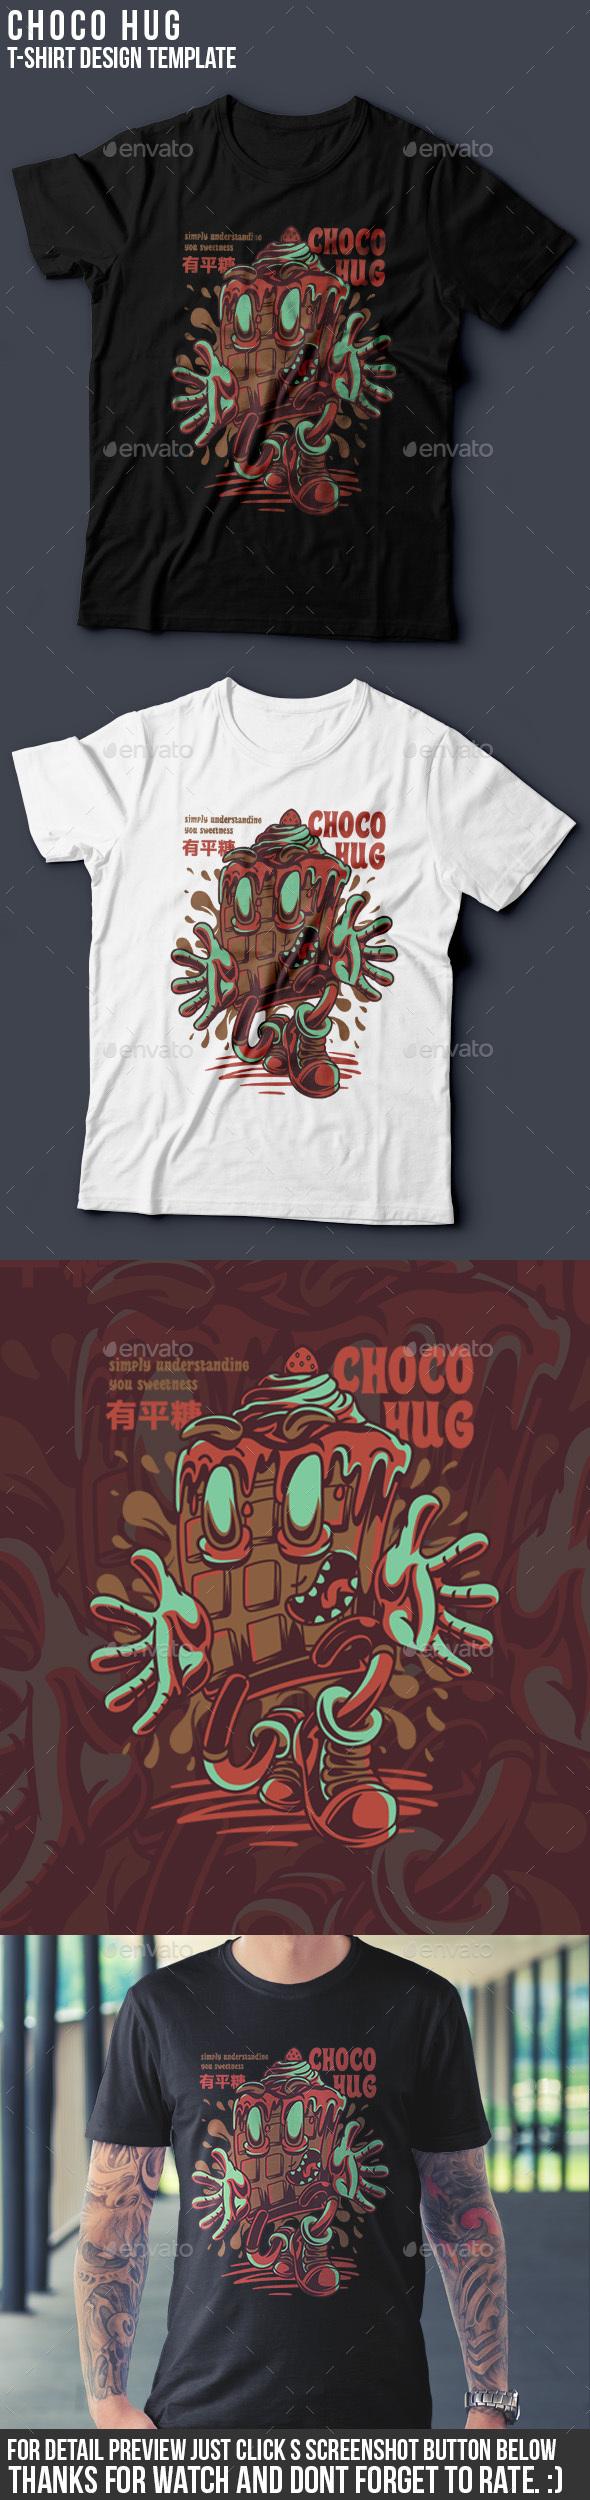 Choco Hug T-Shirt Design